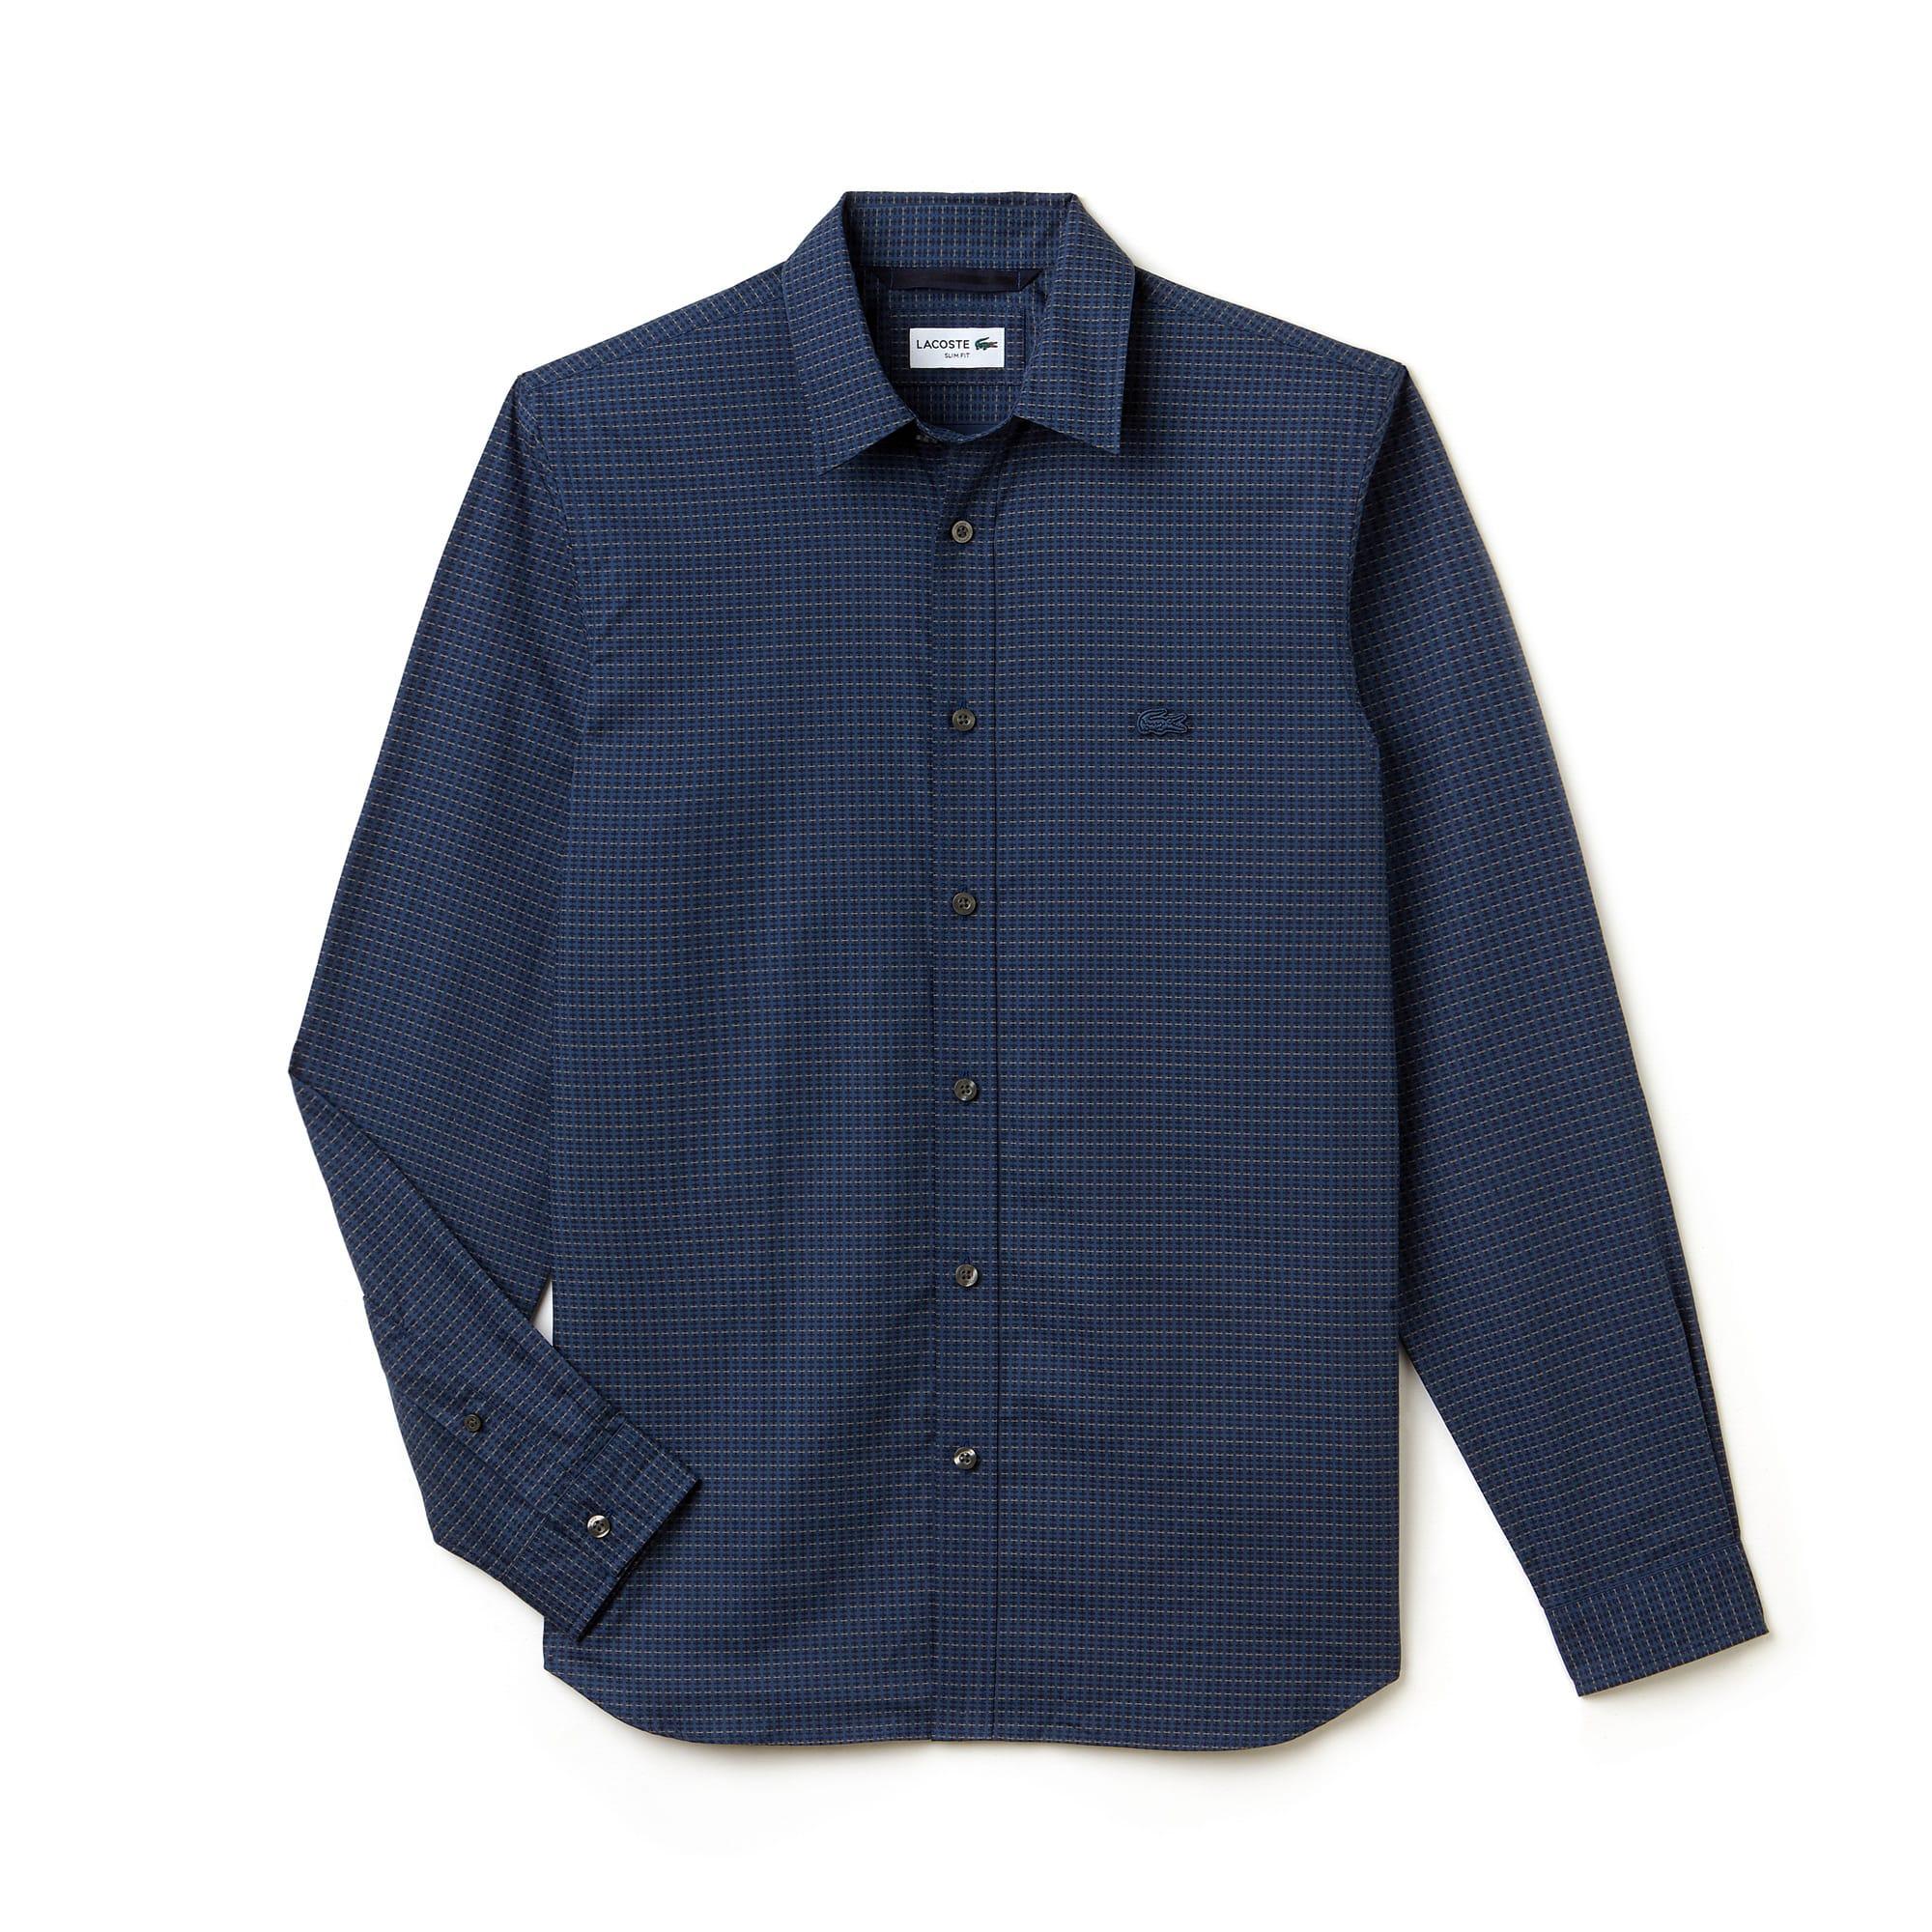 Men's Slim Fit Print Cotton Poplin Shirt